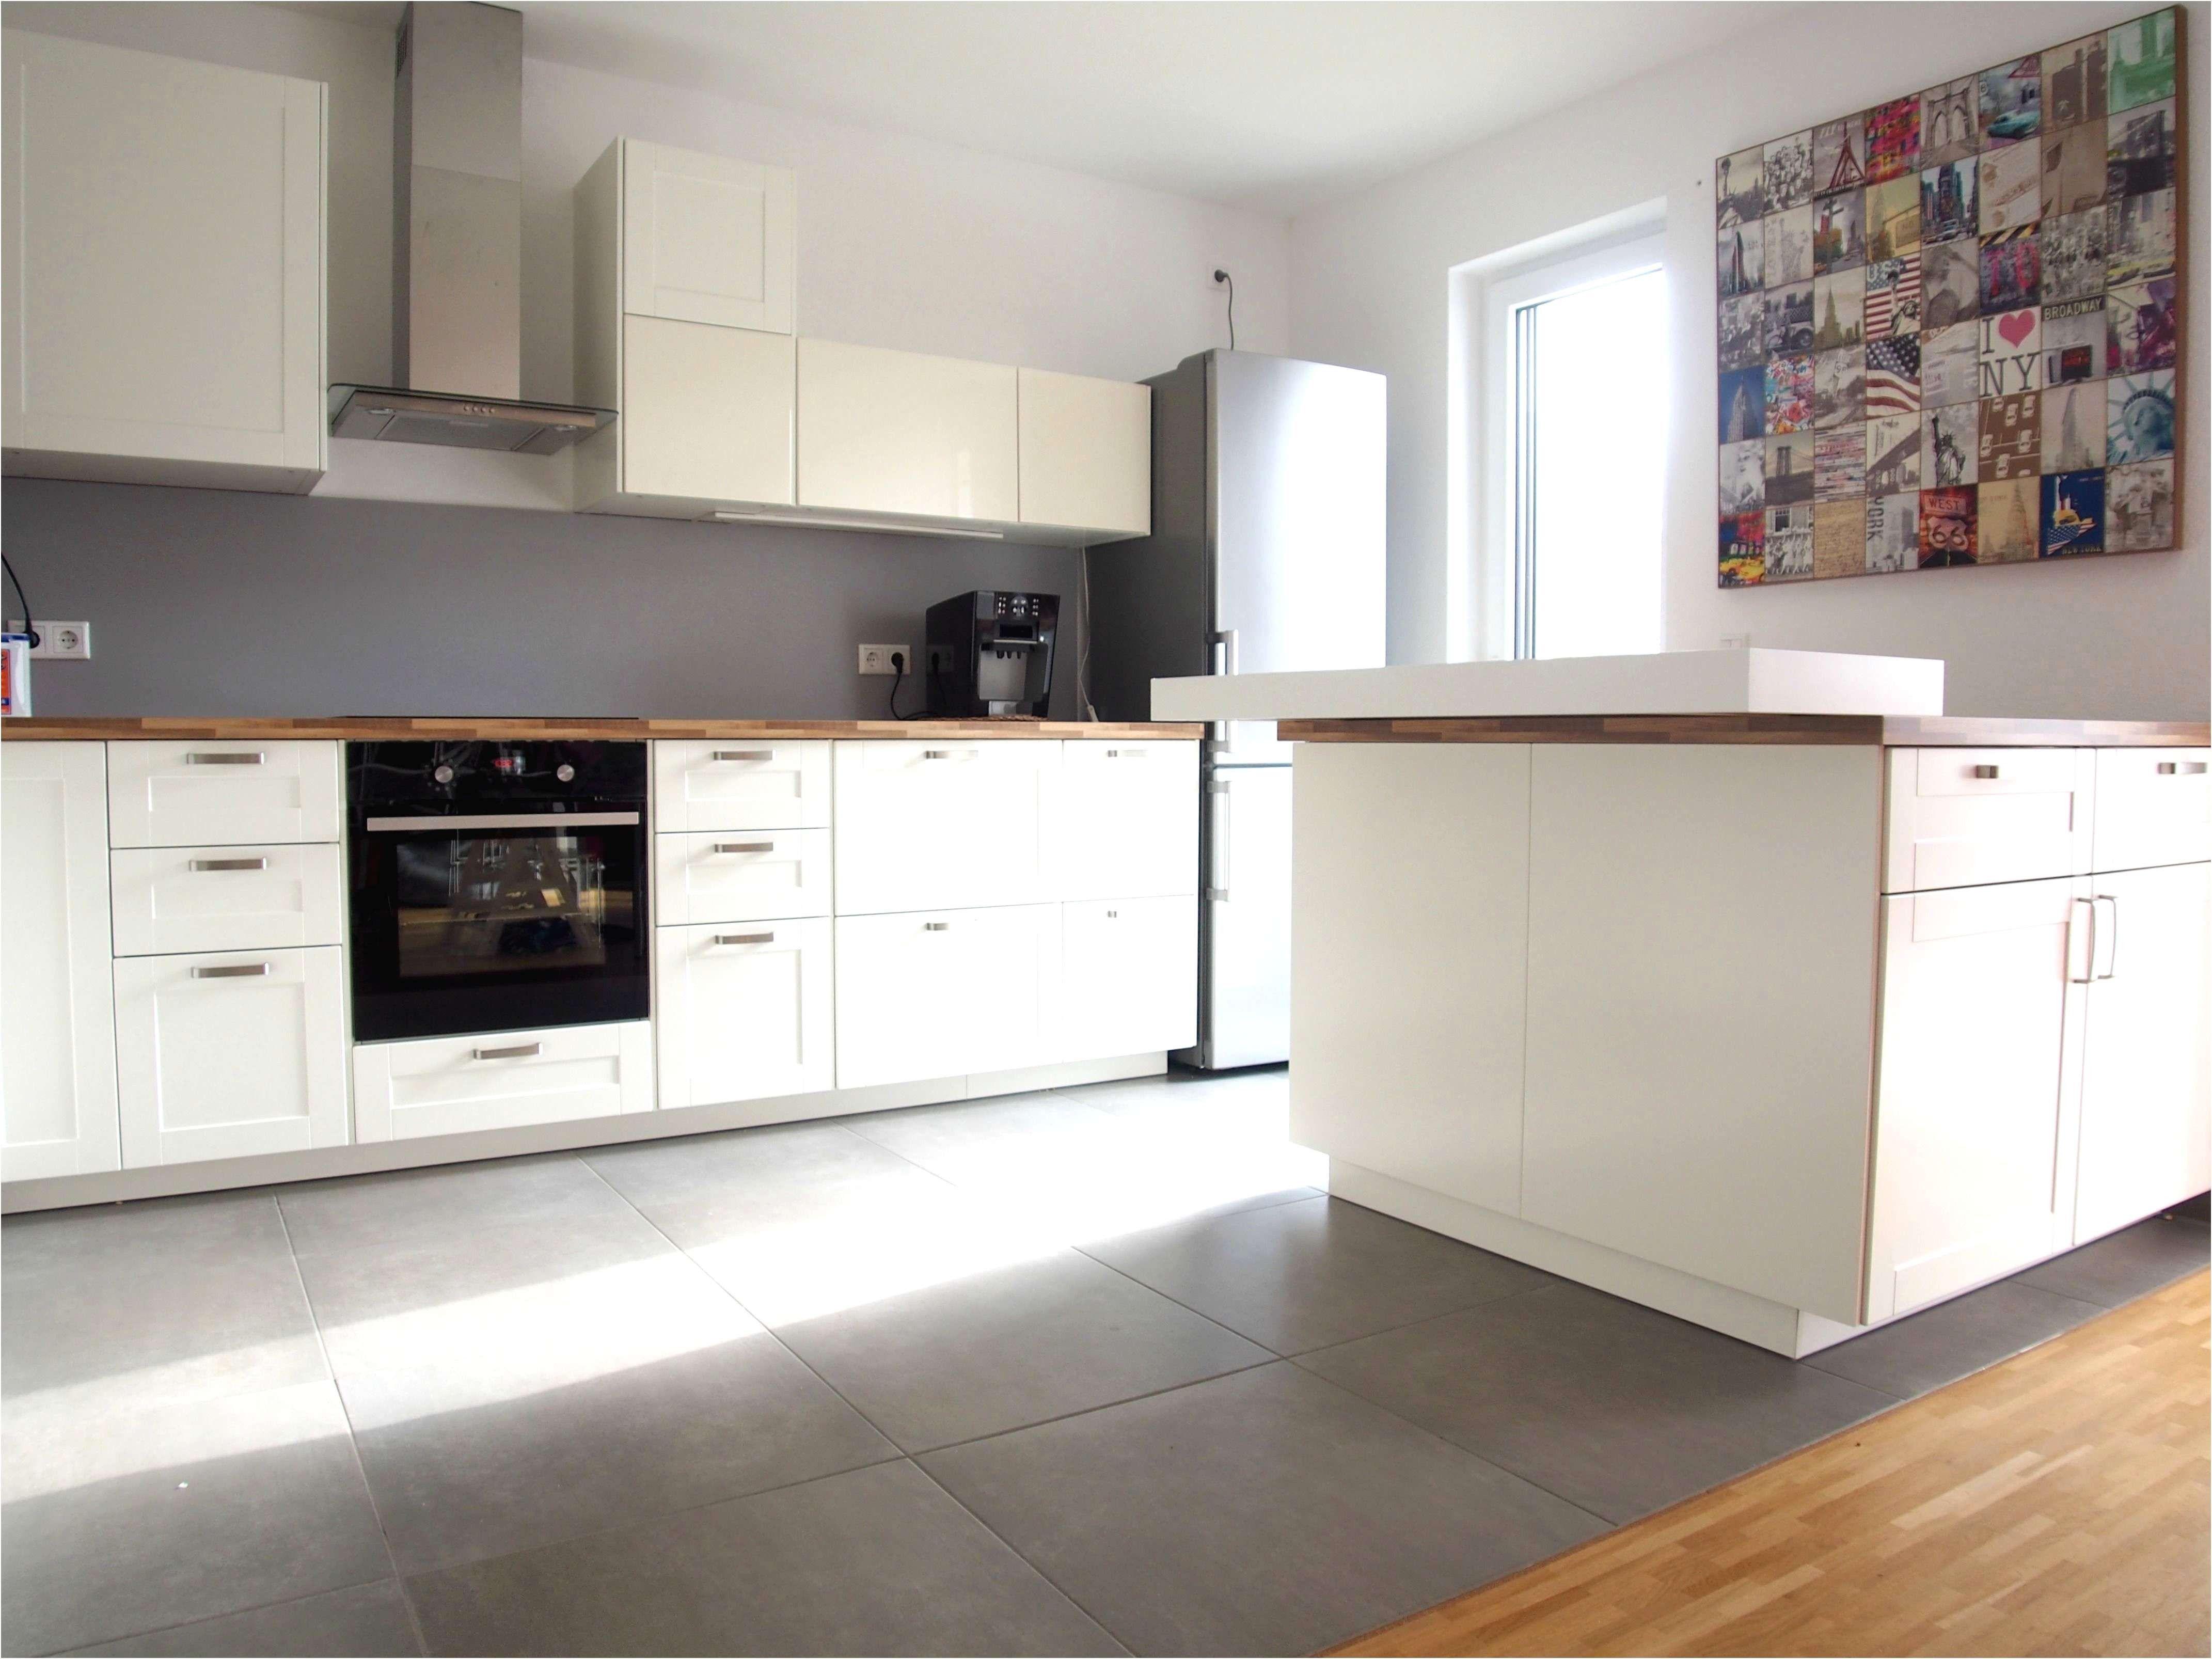 31 Genial Ikea Kuche Edelstahlfront Kitchen Pinterest Olympus